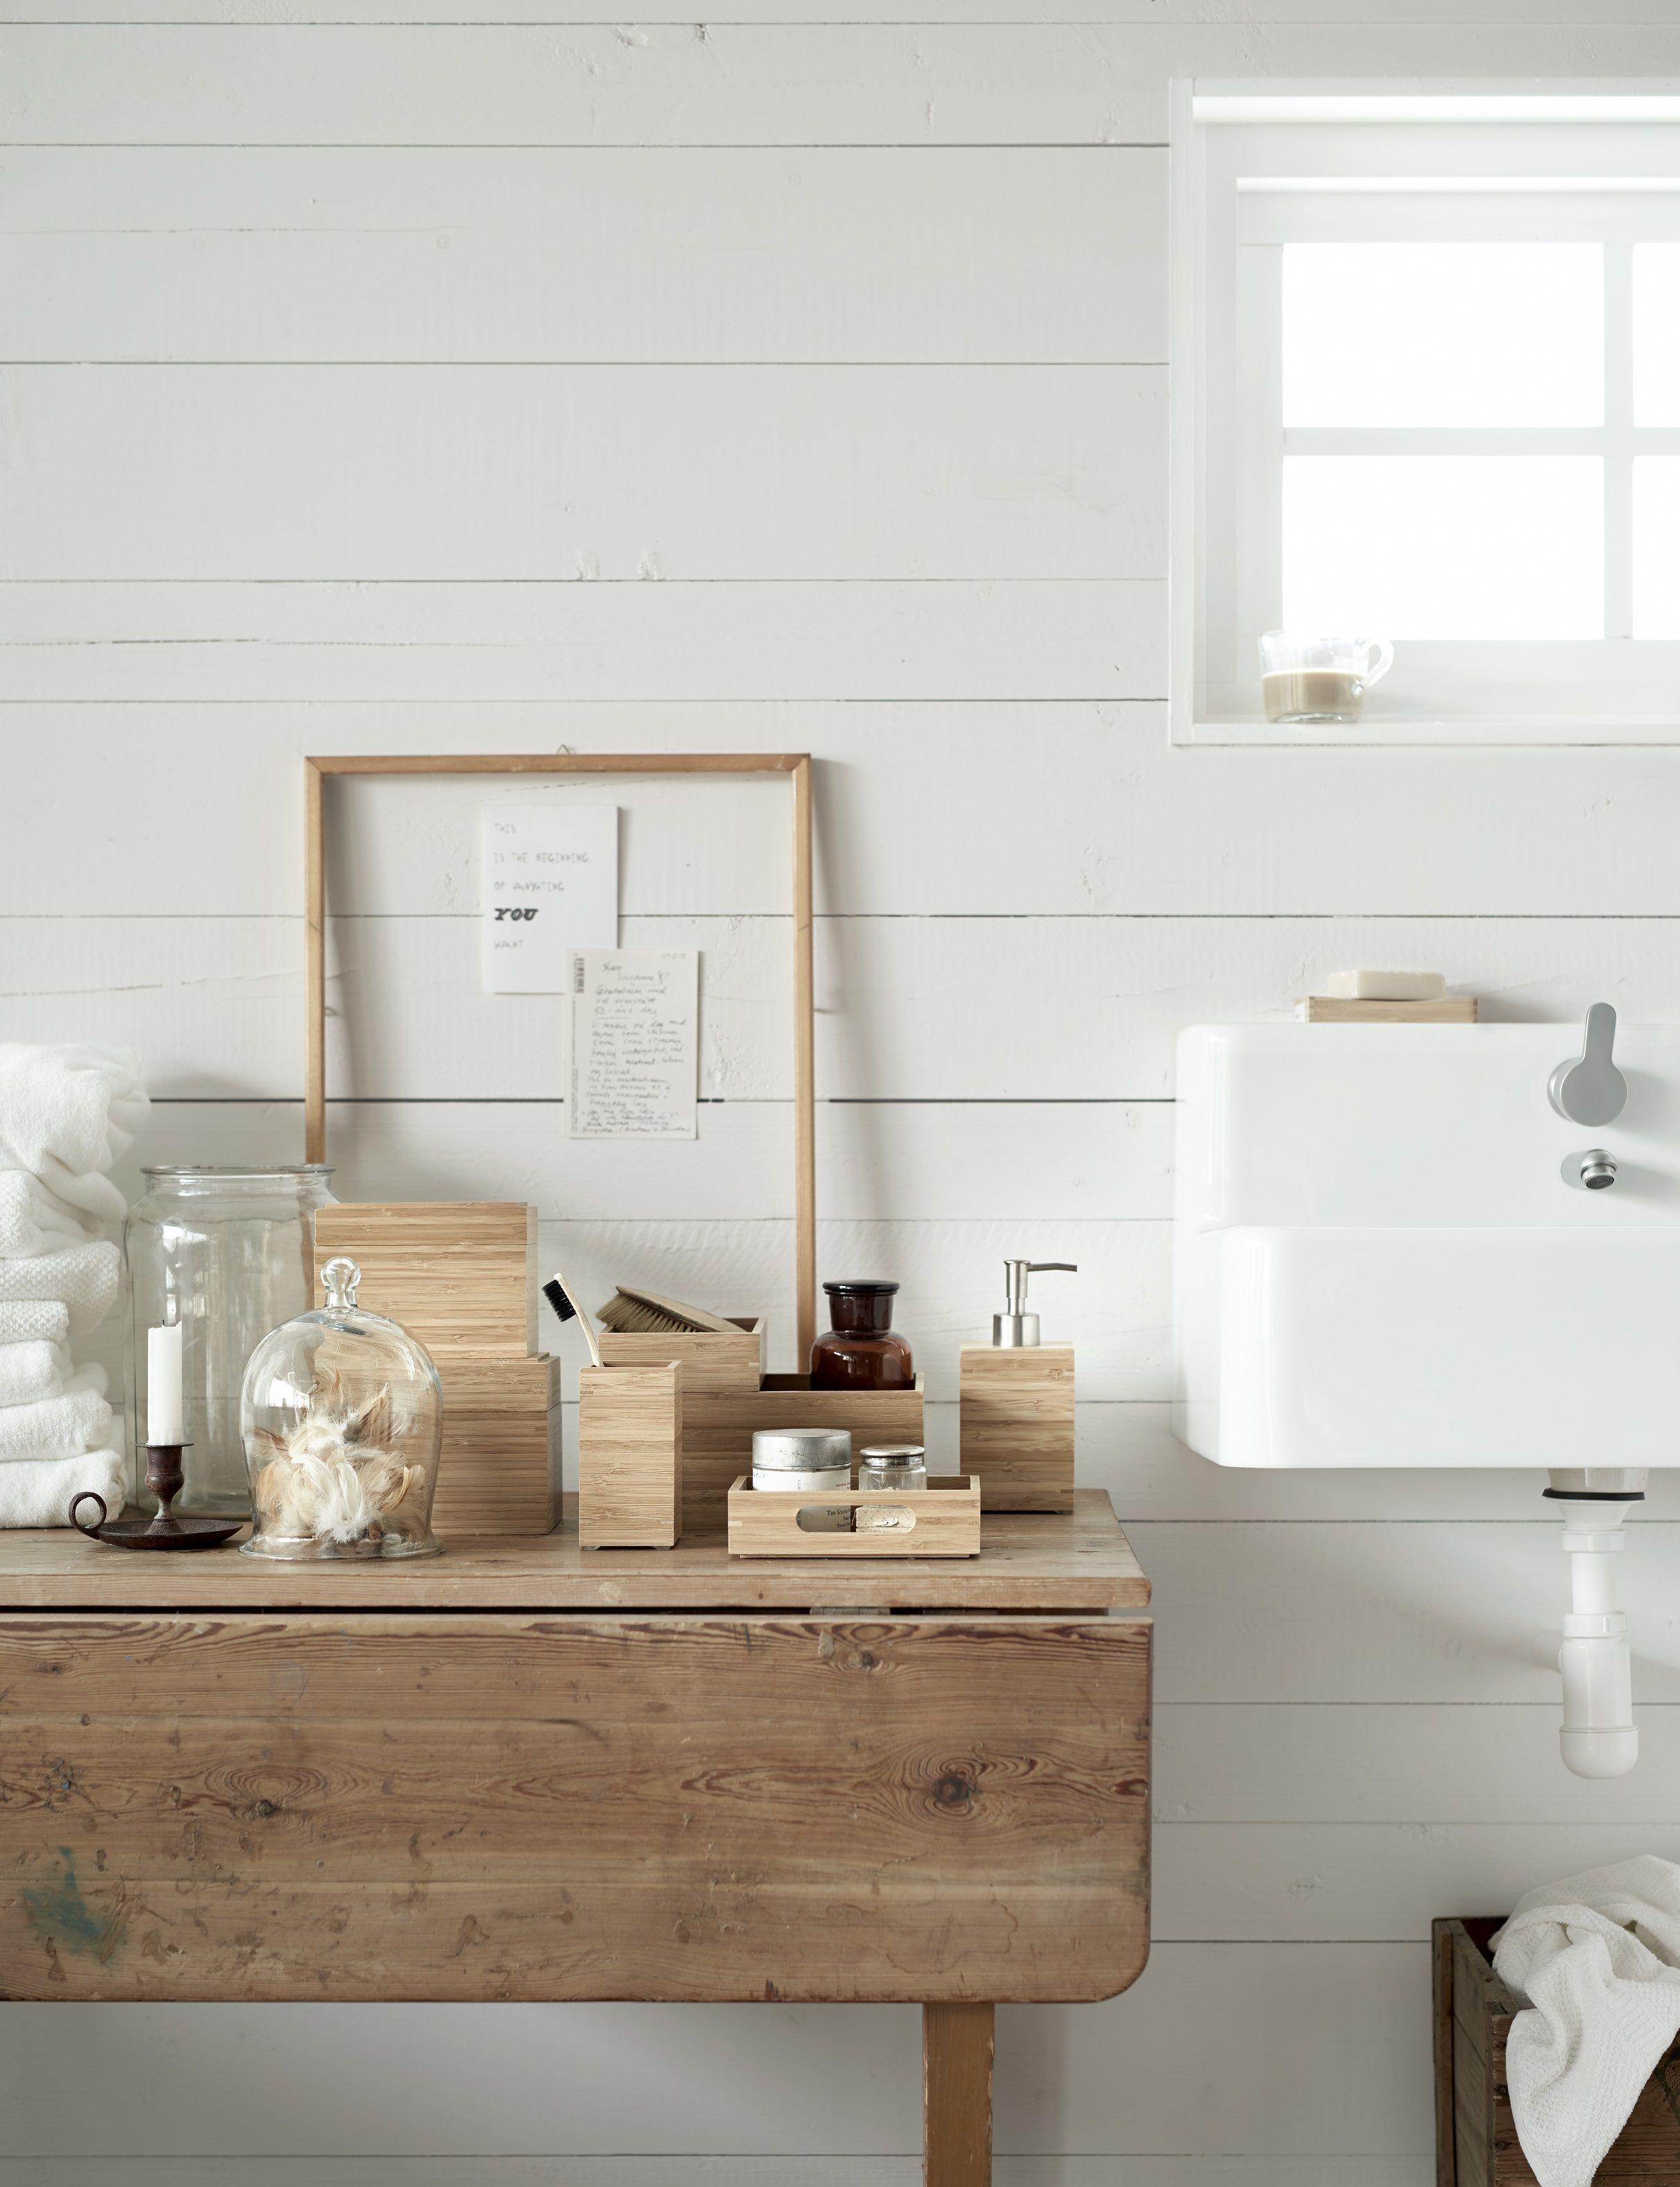 Ikea Groningen Badkamer : Ikea badkamer accessoires huis ideeën huis ideeën